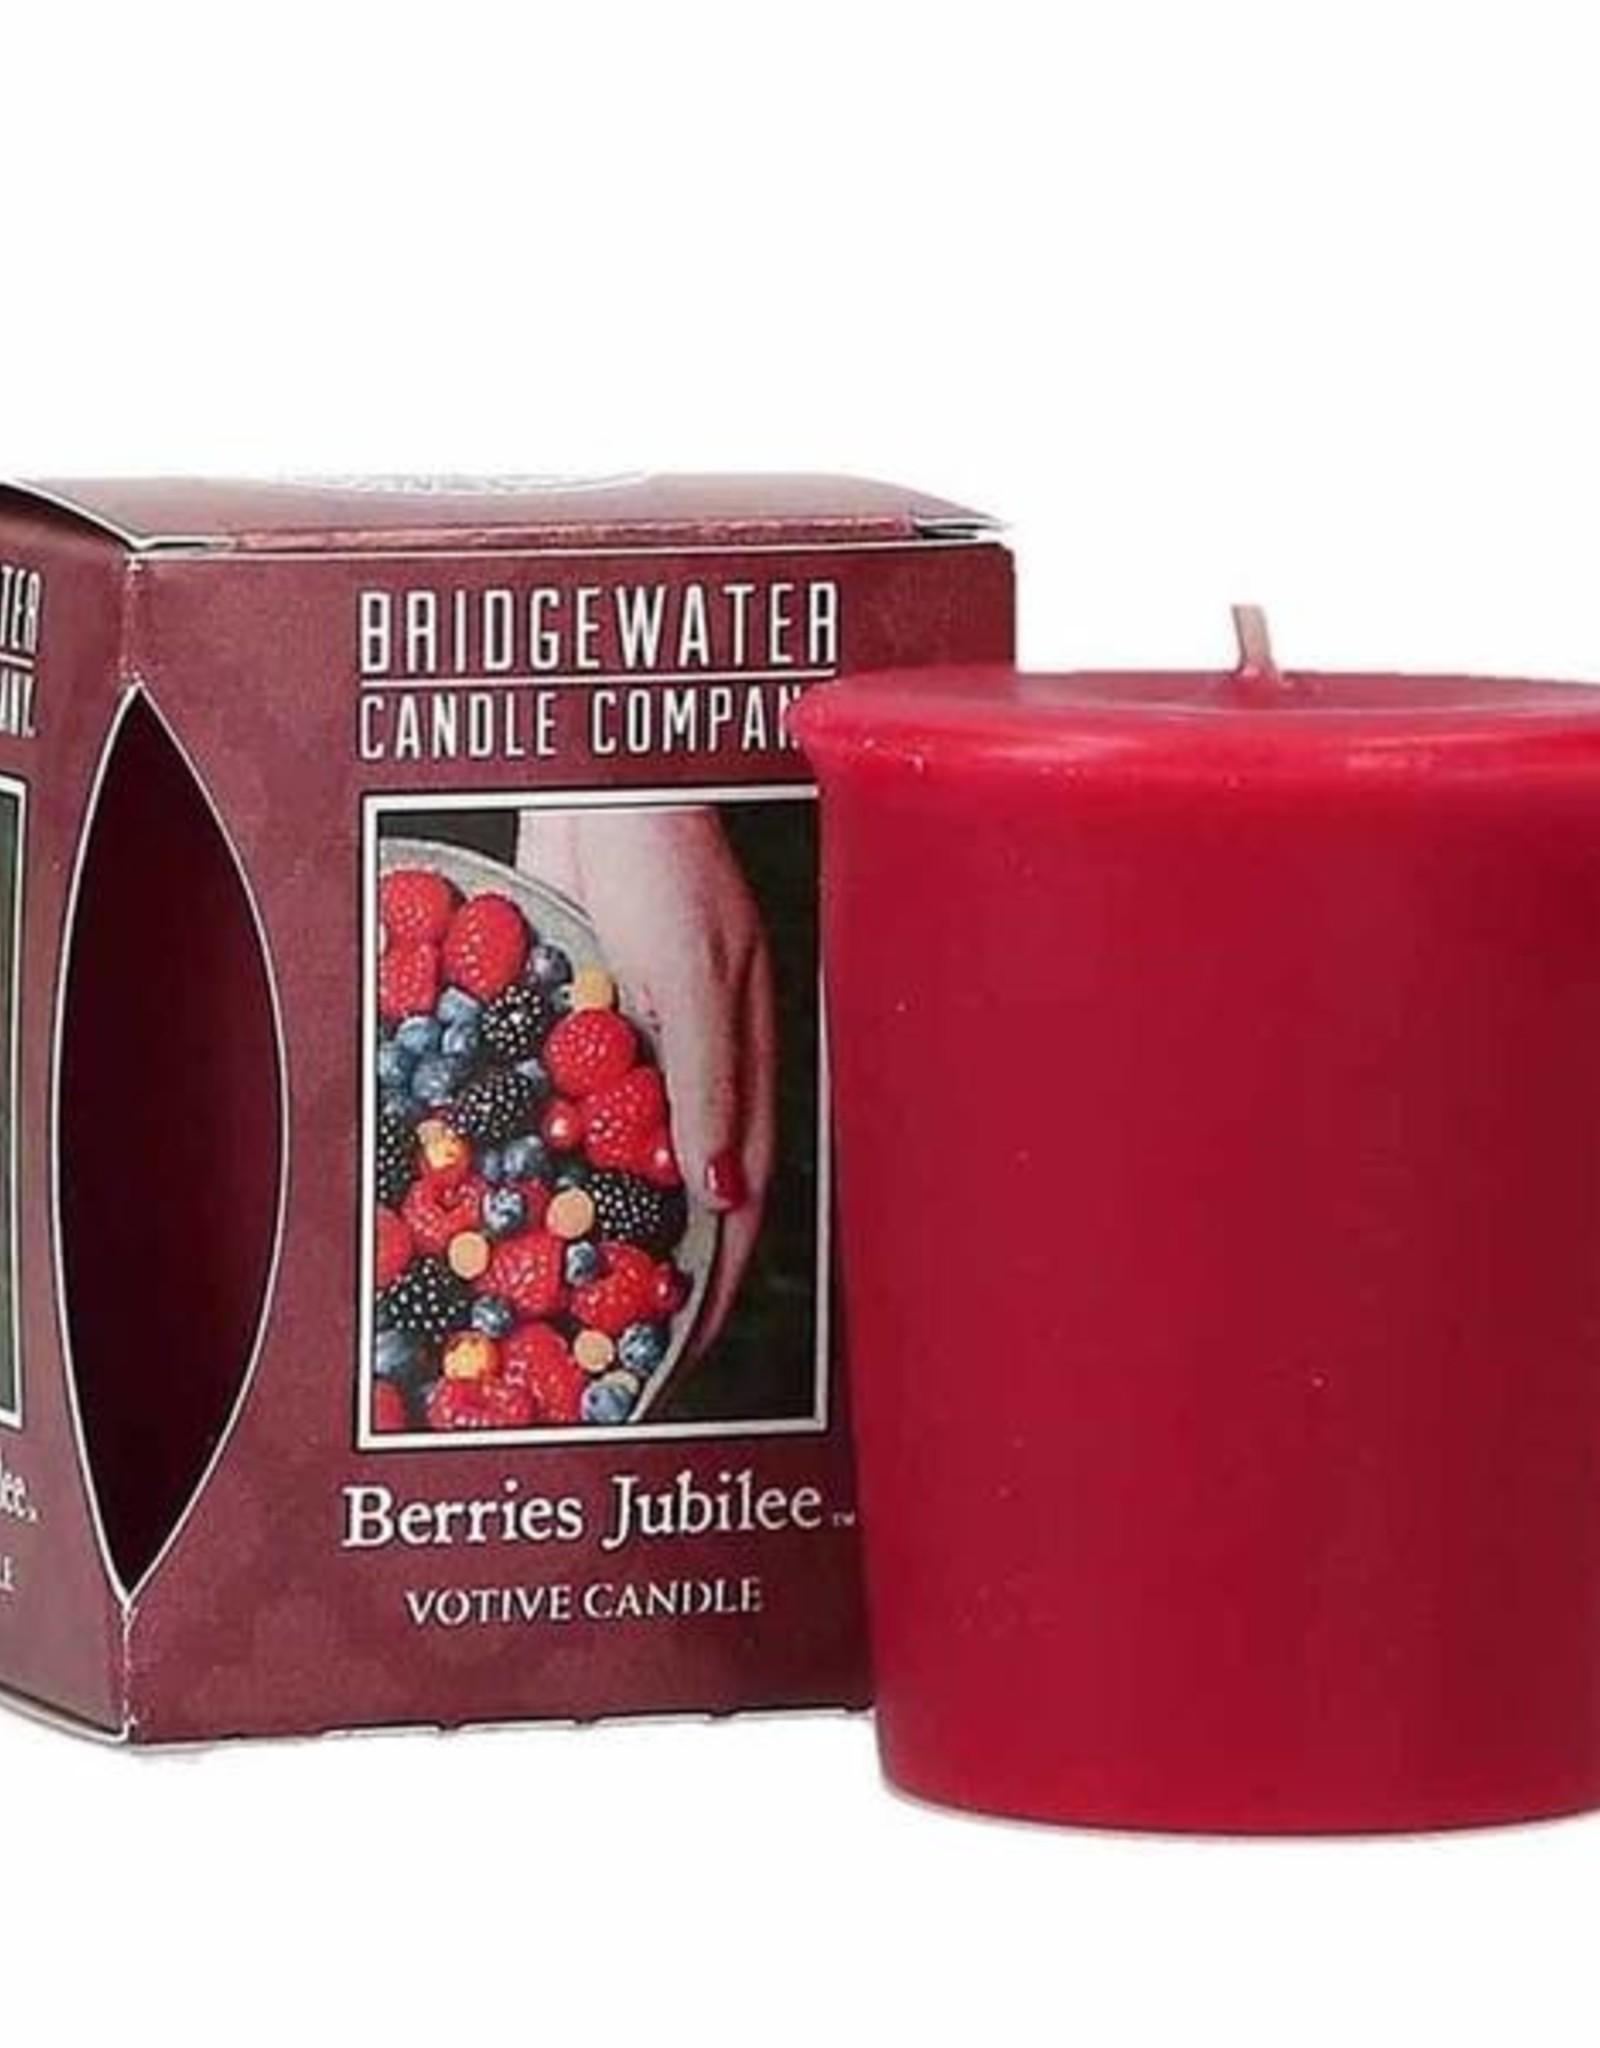 Bridgewater Votive Berries Jubilee